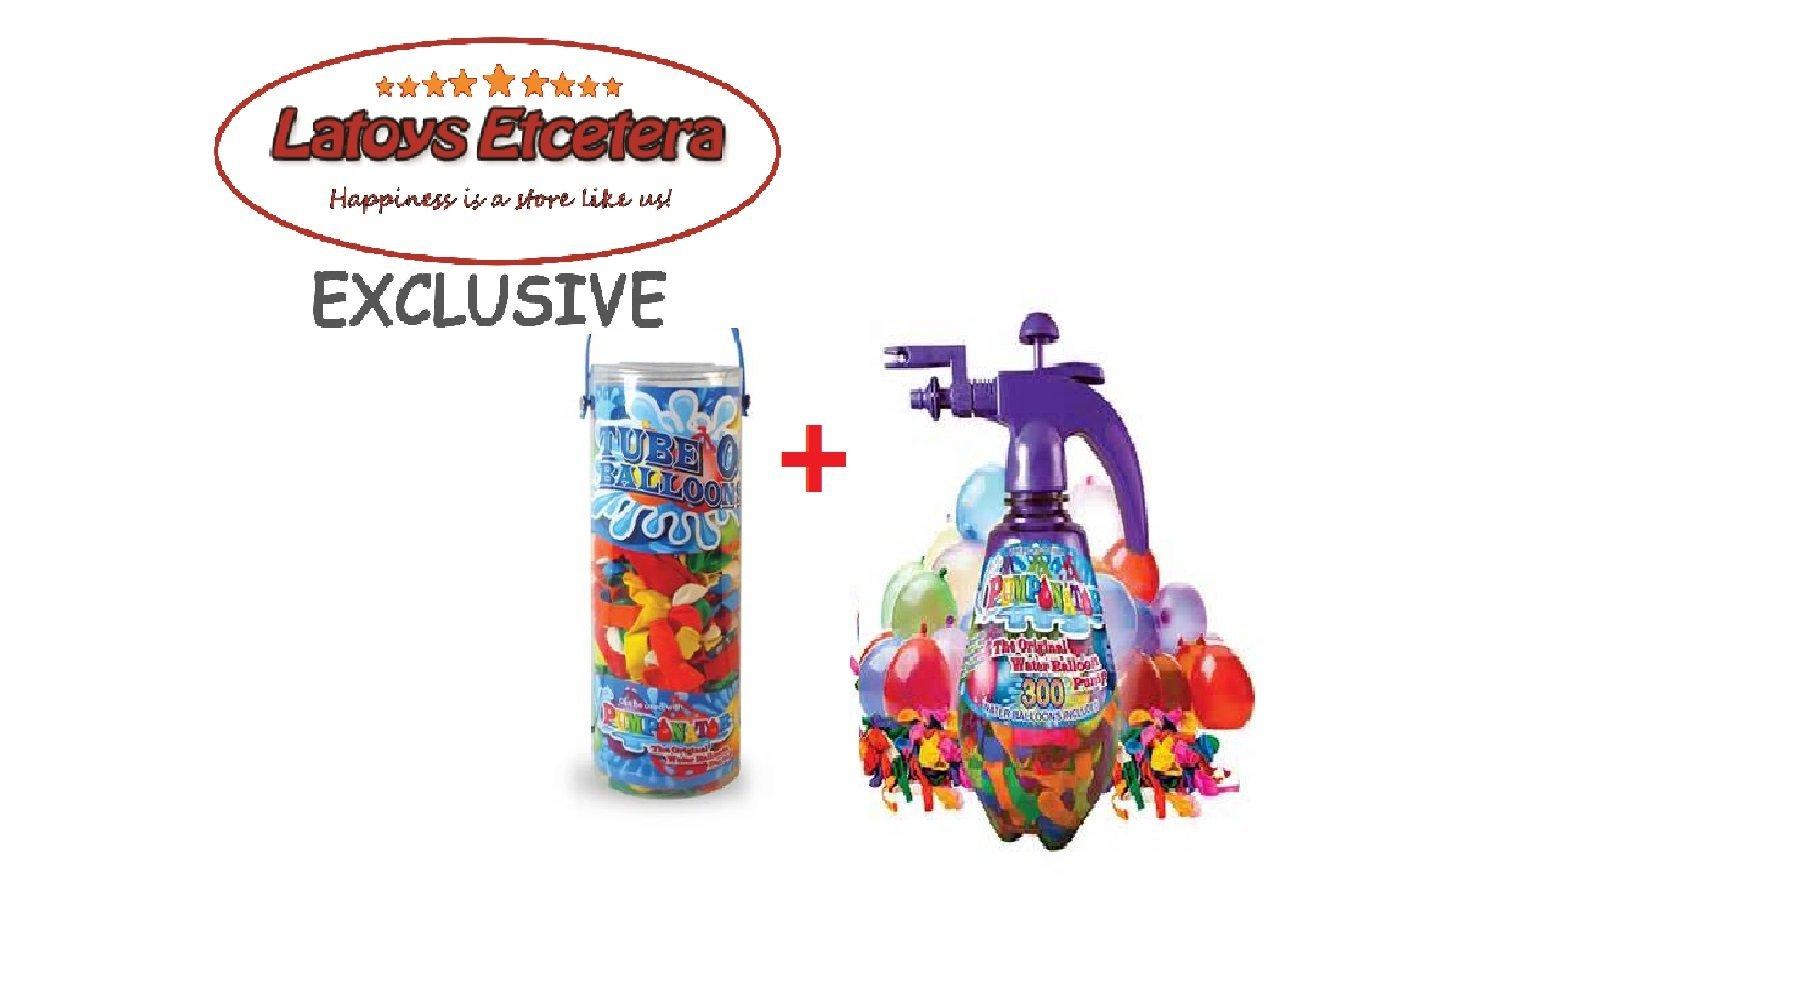 Pumponator Water Balloon Pump (Purple) and Tube o' Balloons Gift Bundle Set